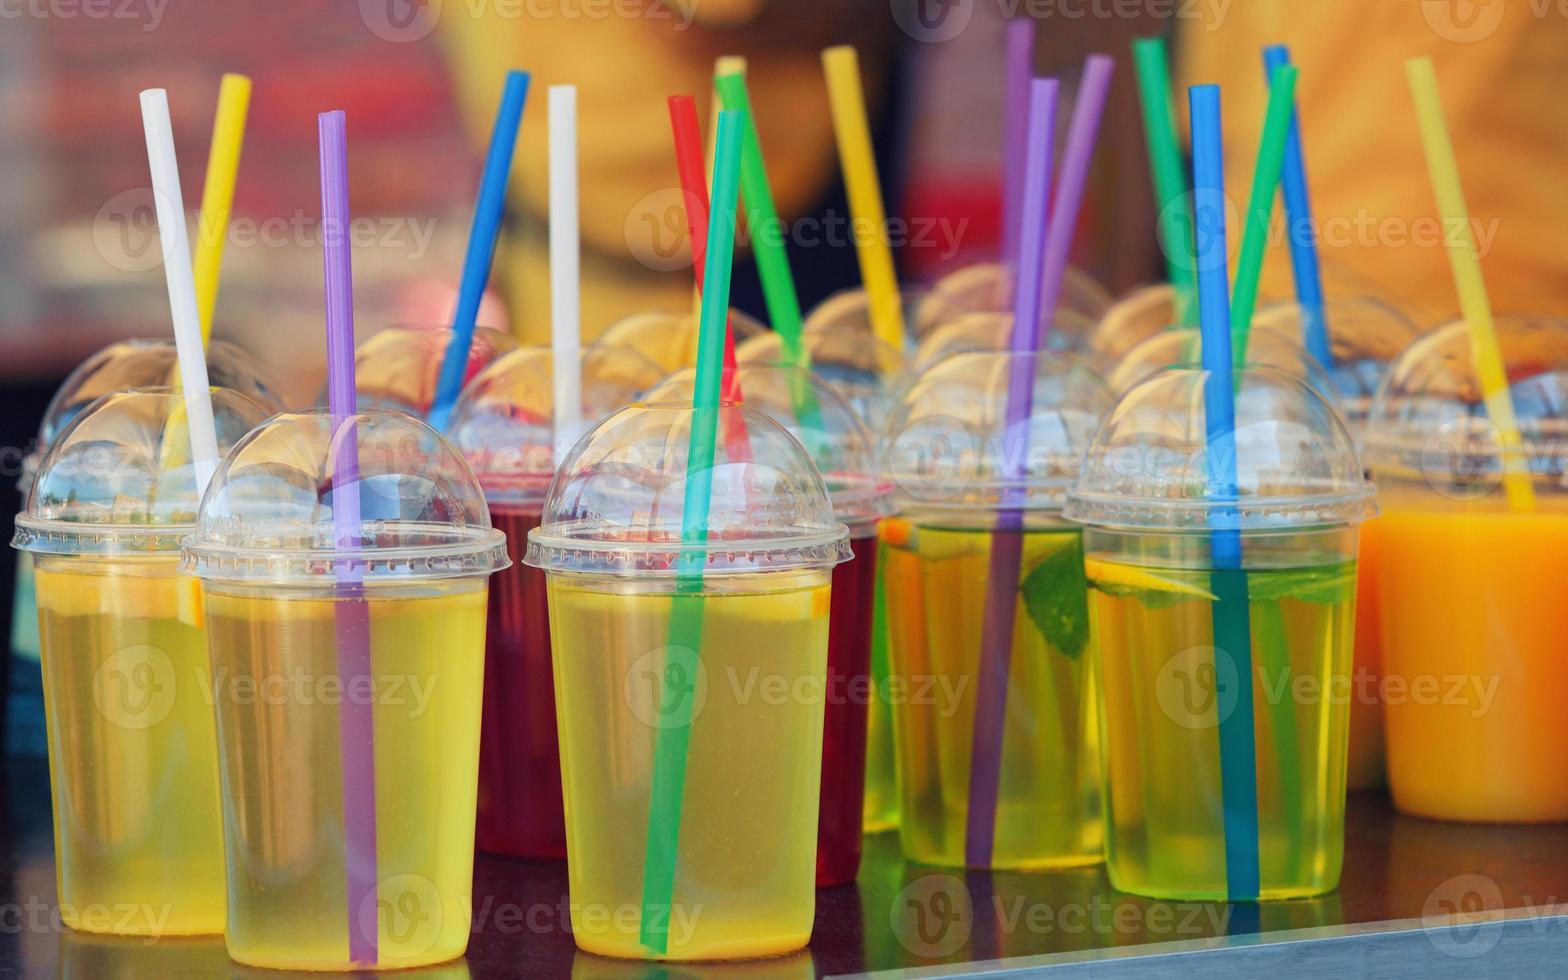 levendige drank in plastic glazen foto